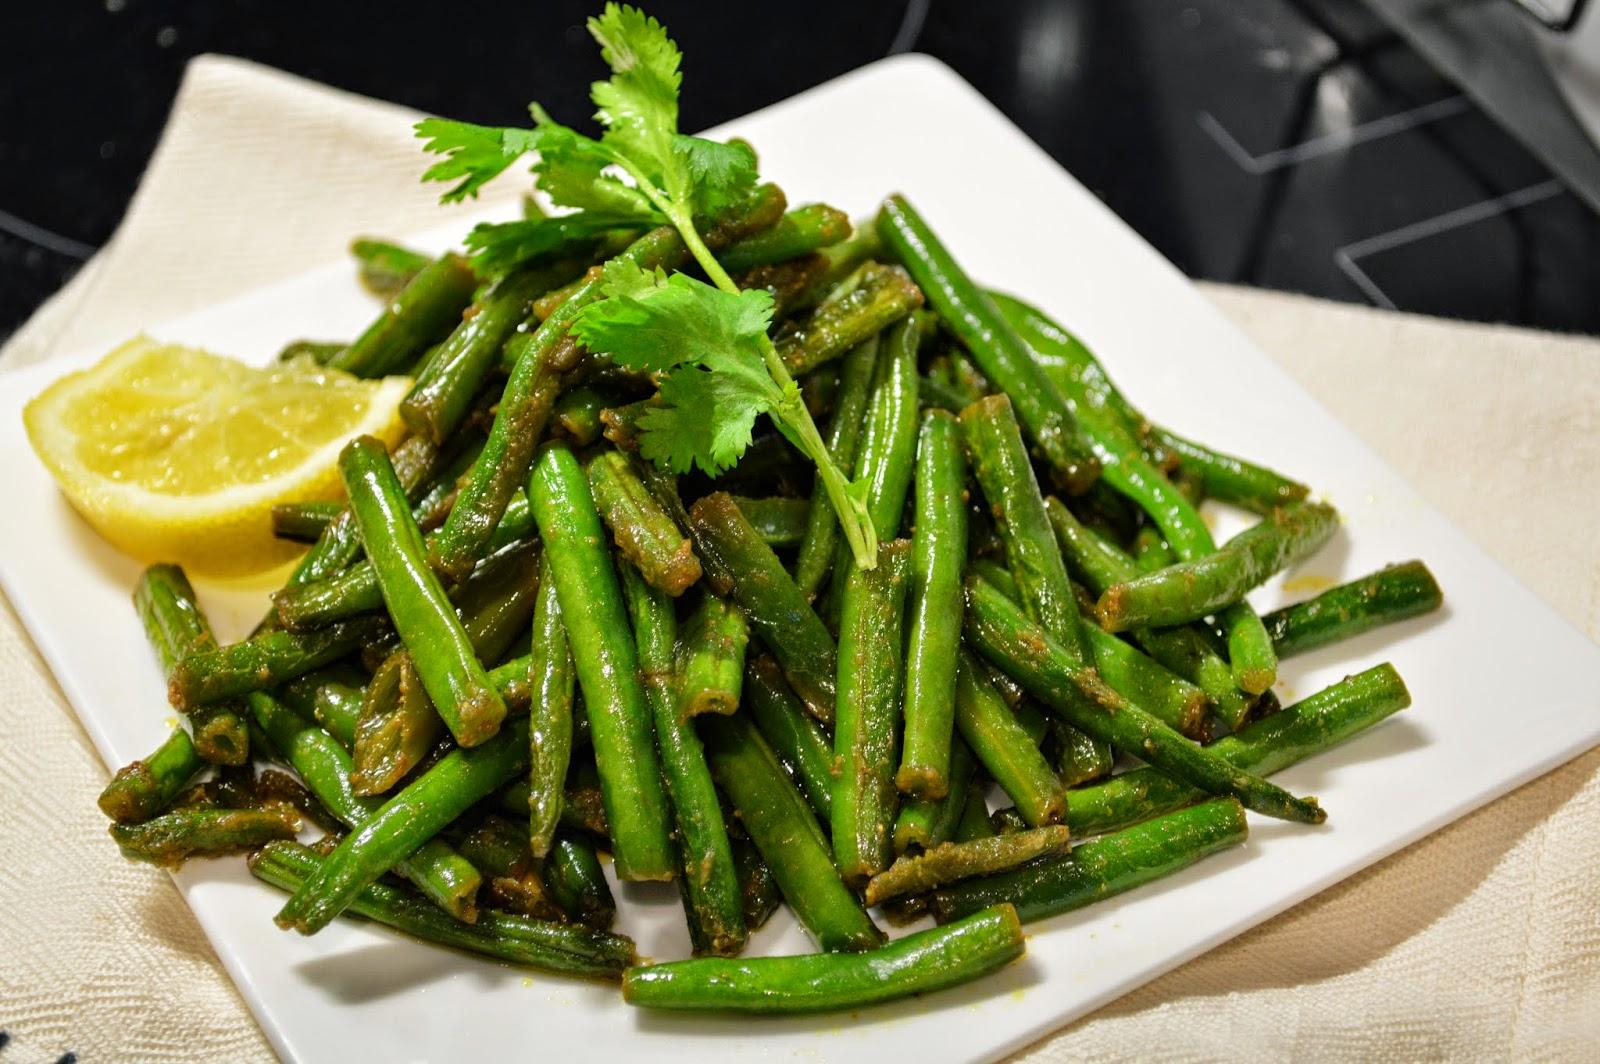 Green beans sabzi - Meat free Monday